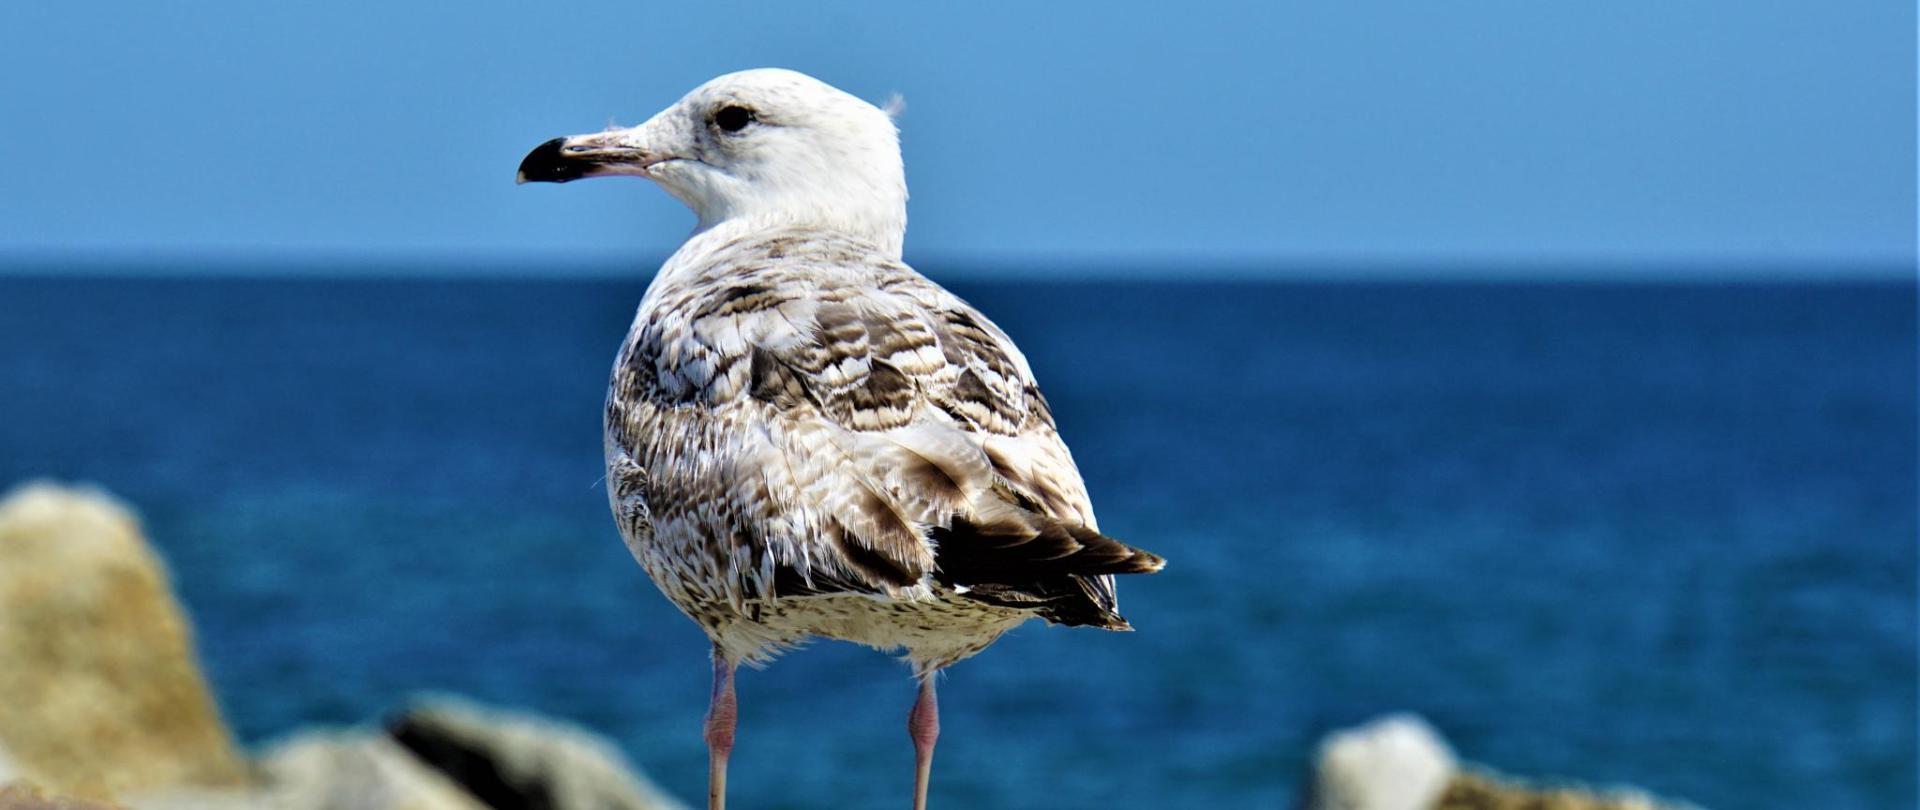 seagull-4263086.jpg